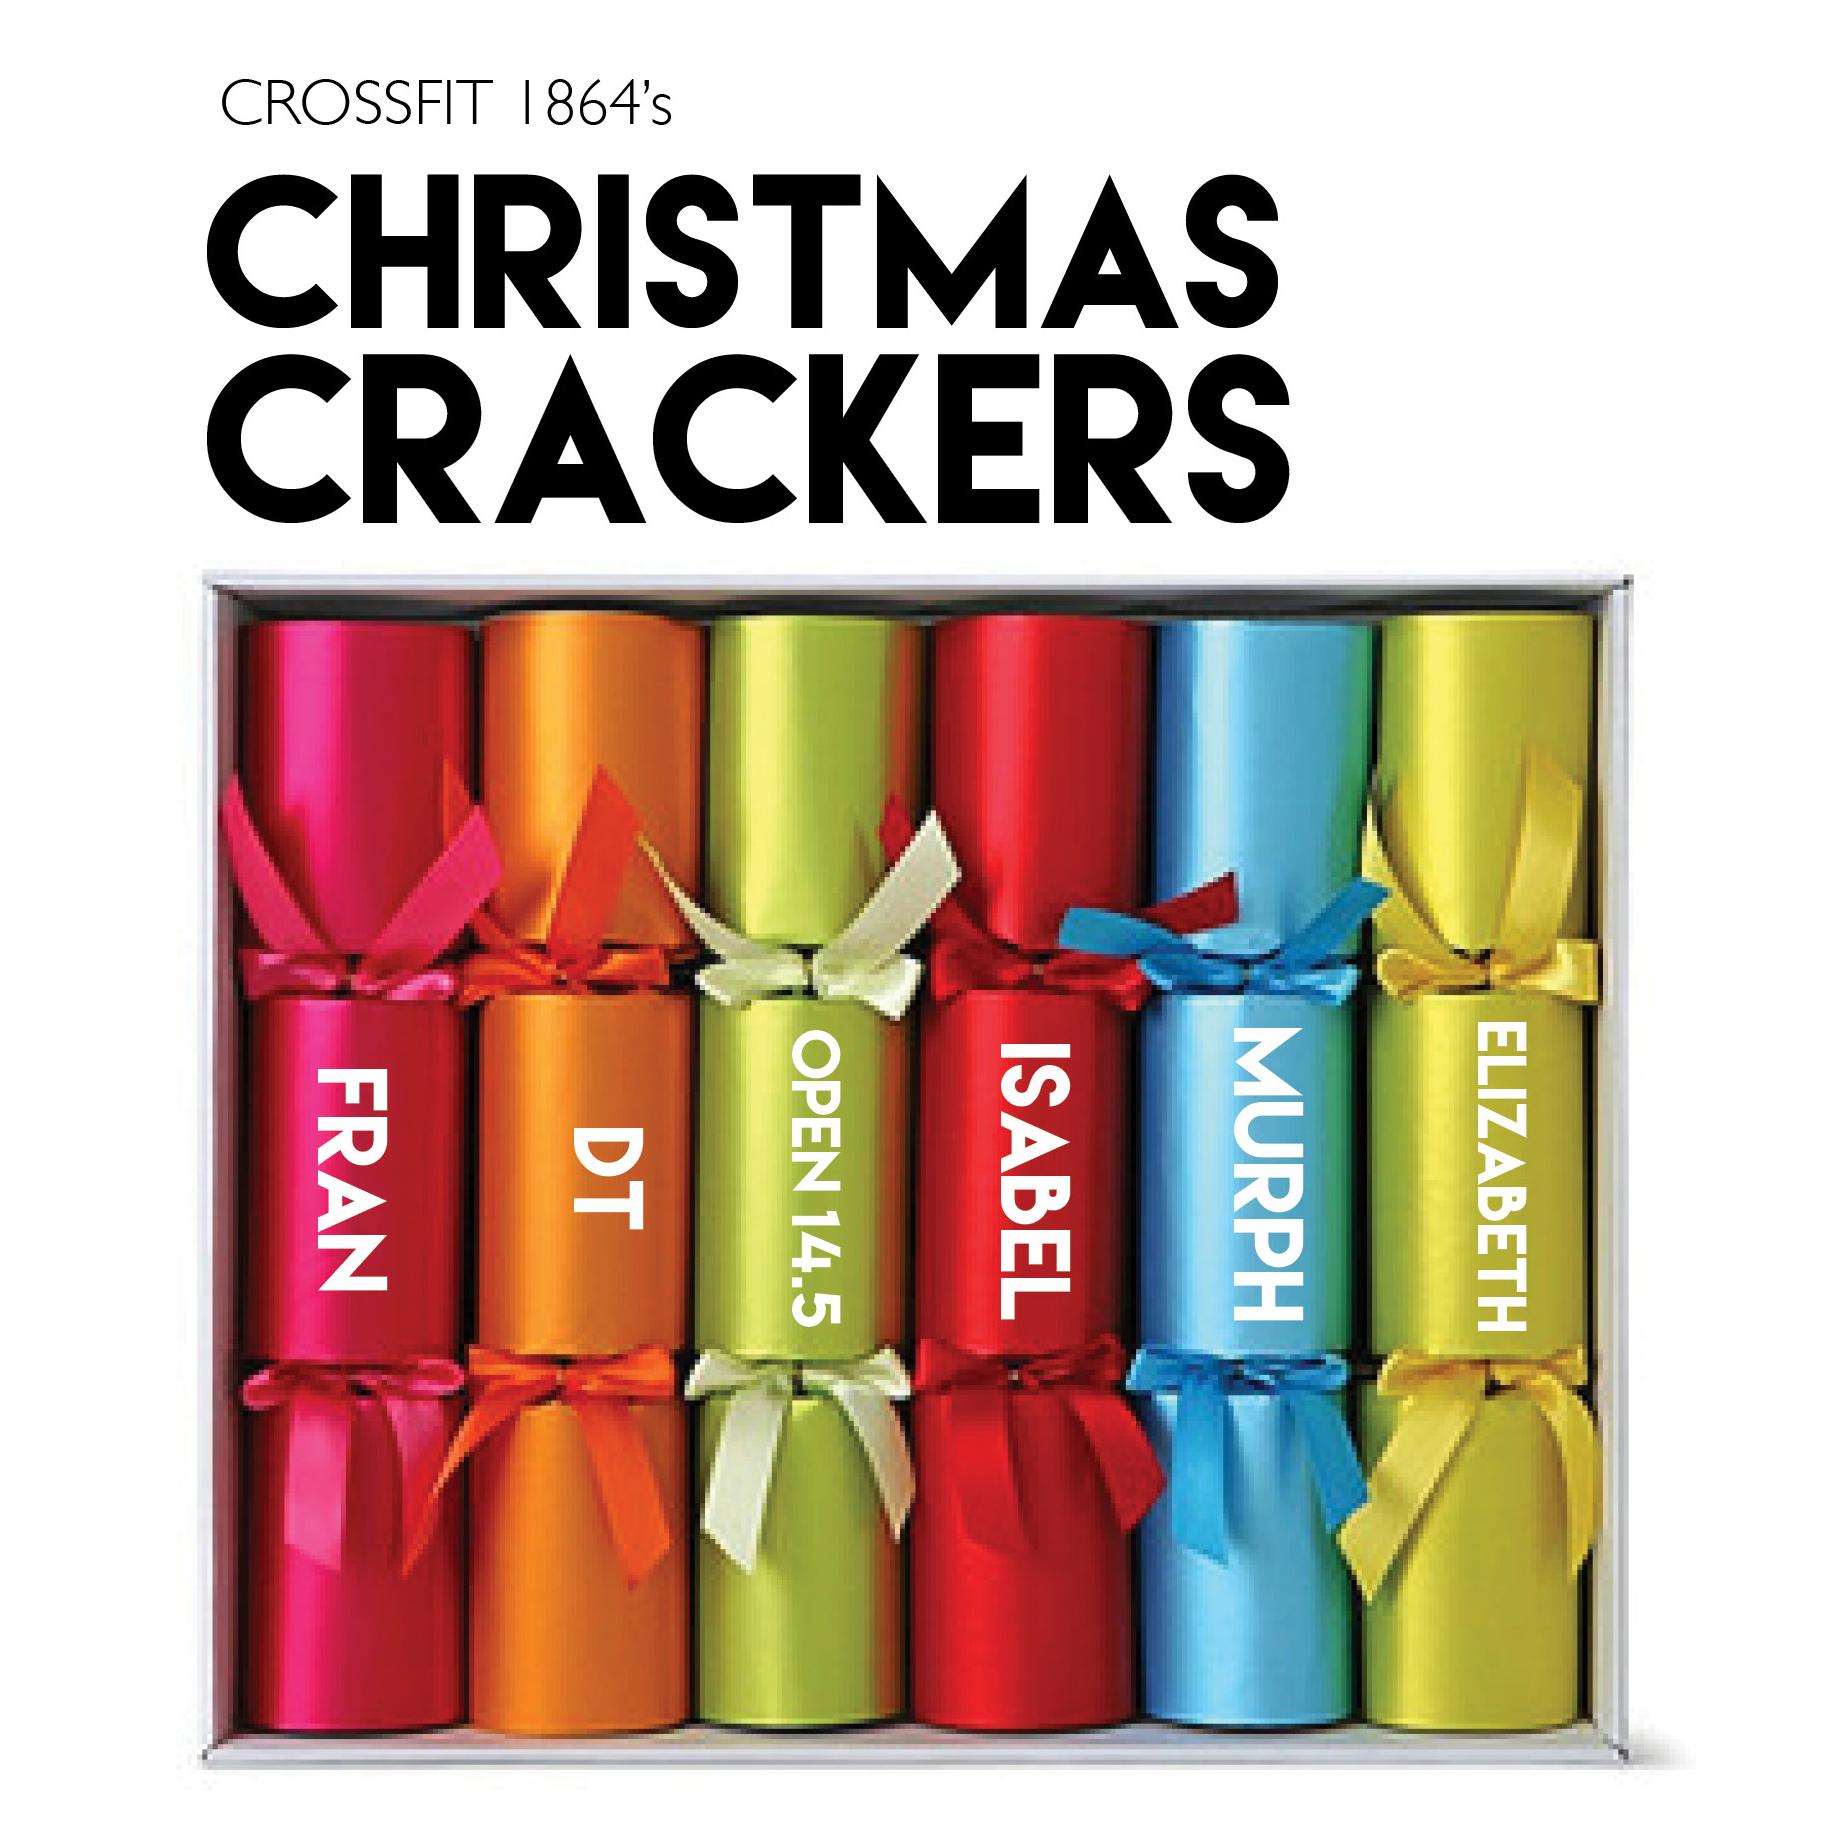 christmascrackers1864.jpg